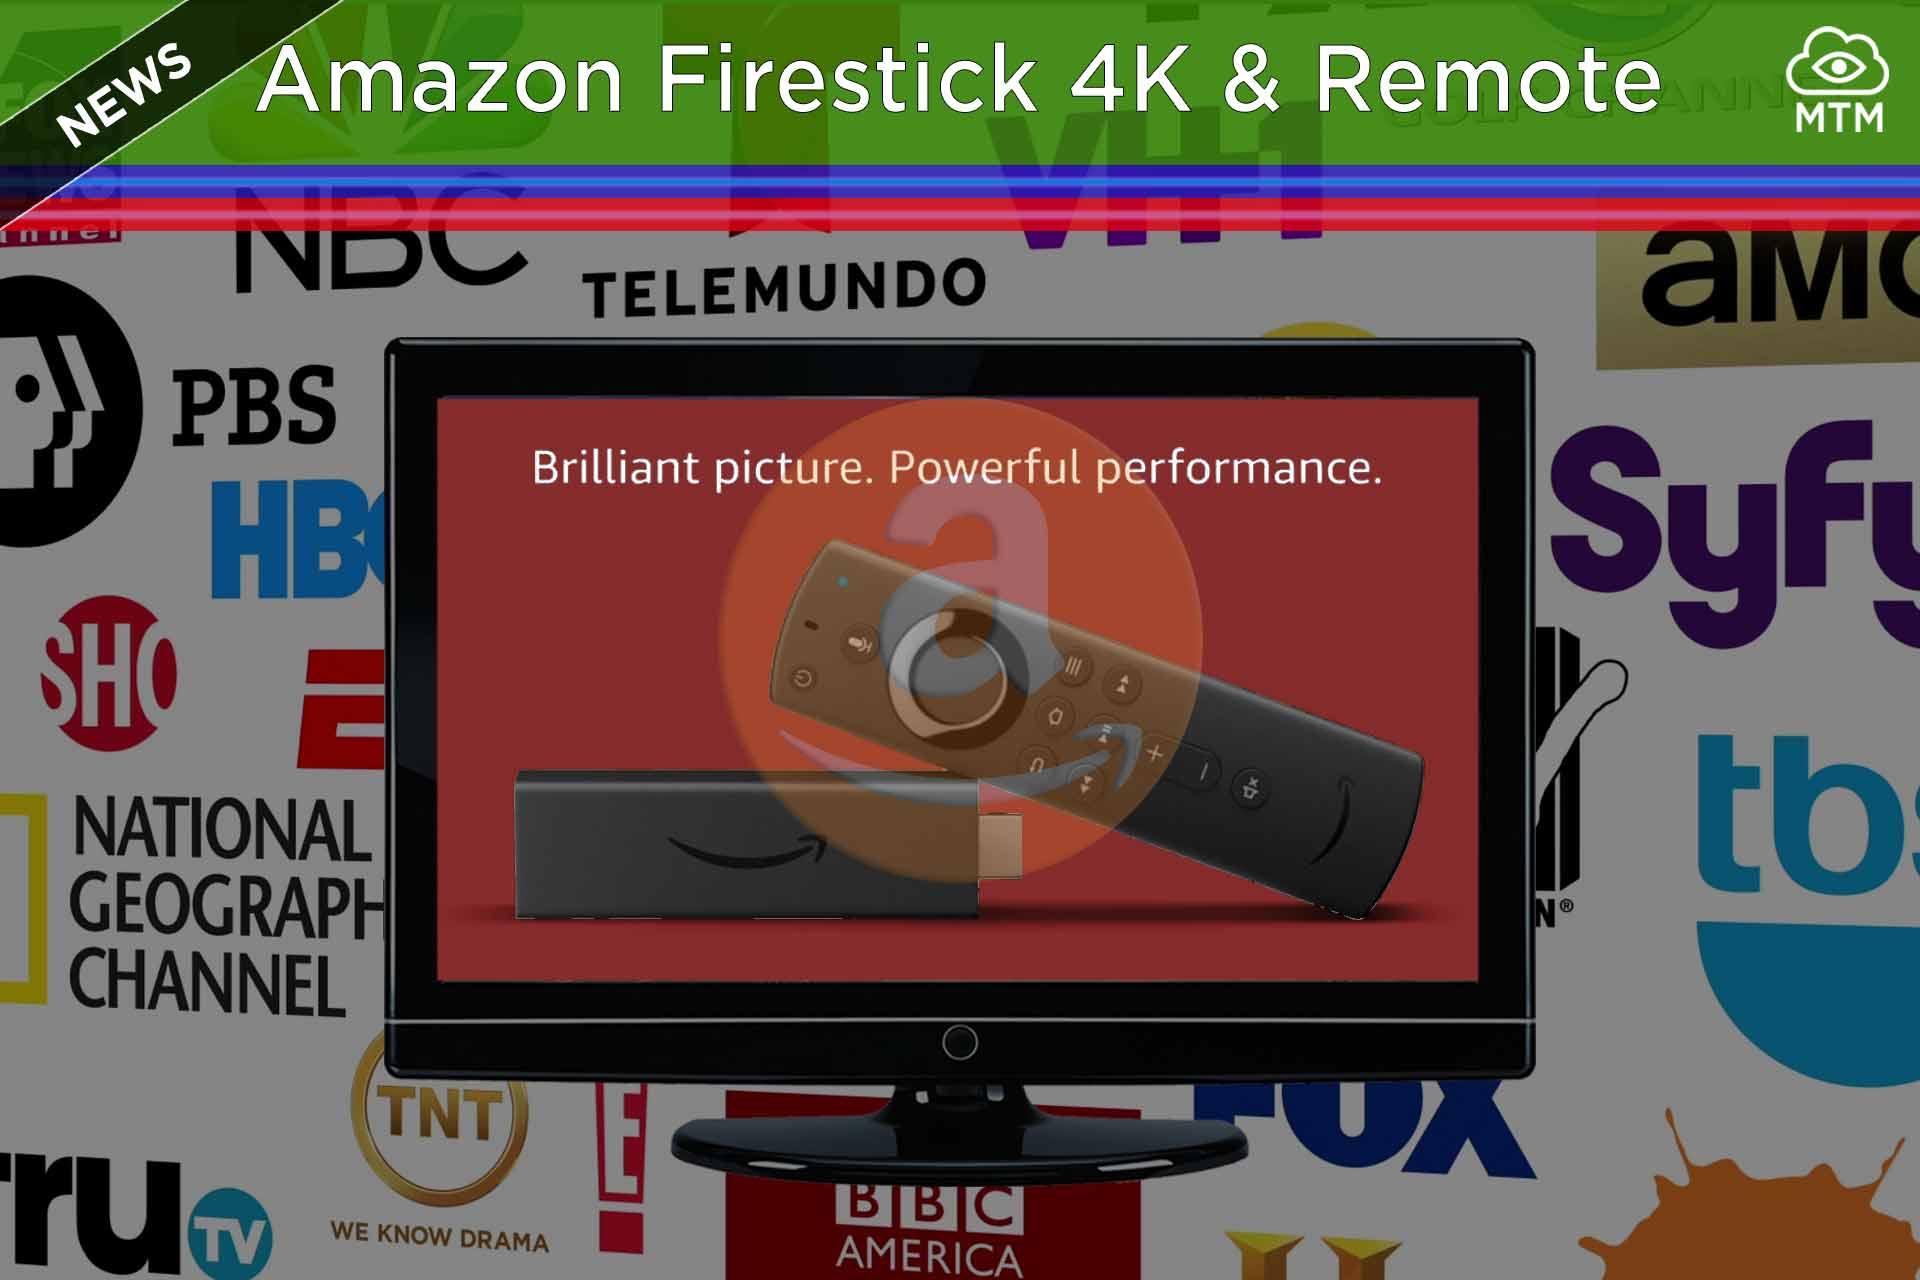 $50 Amazon 4K Firestick & New Improved Remote Control